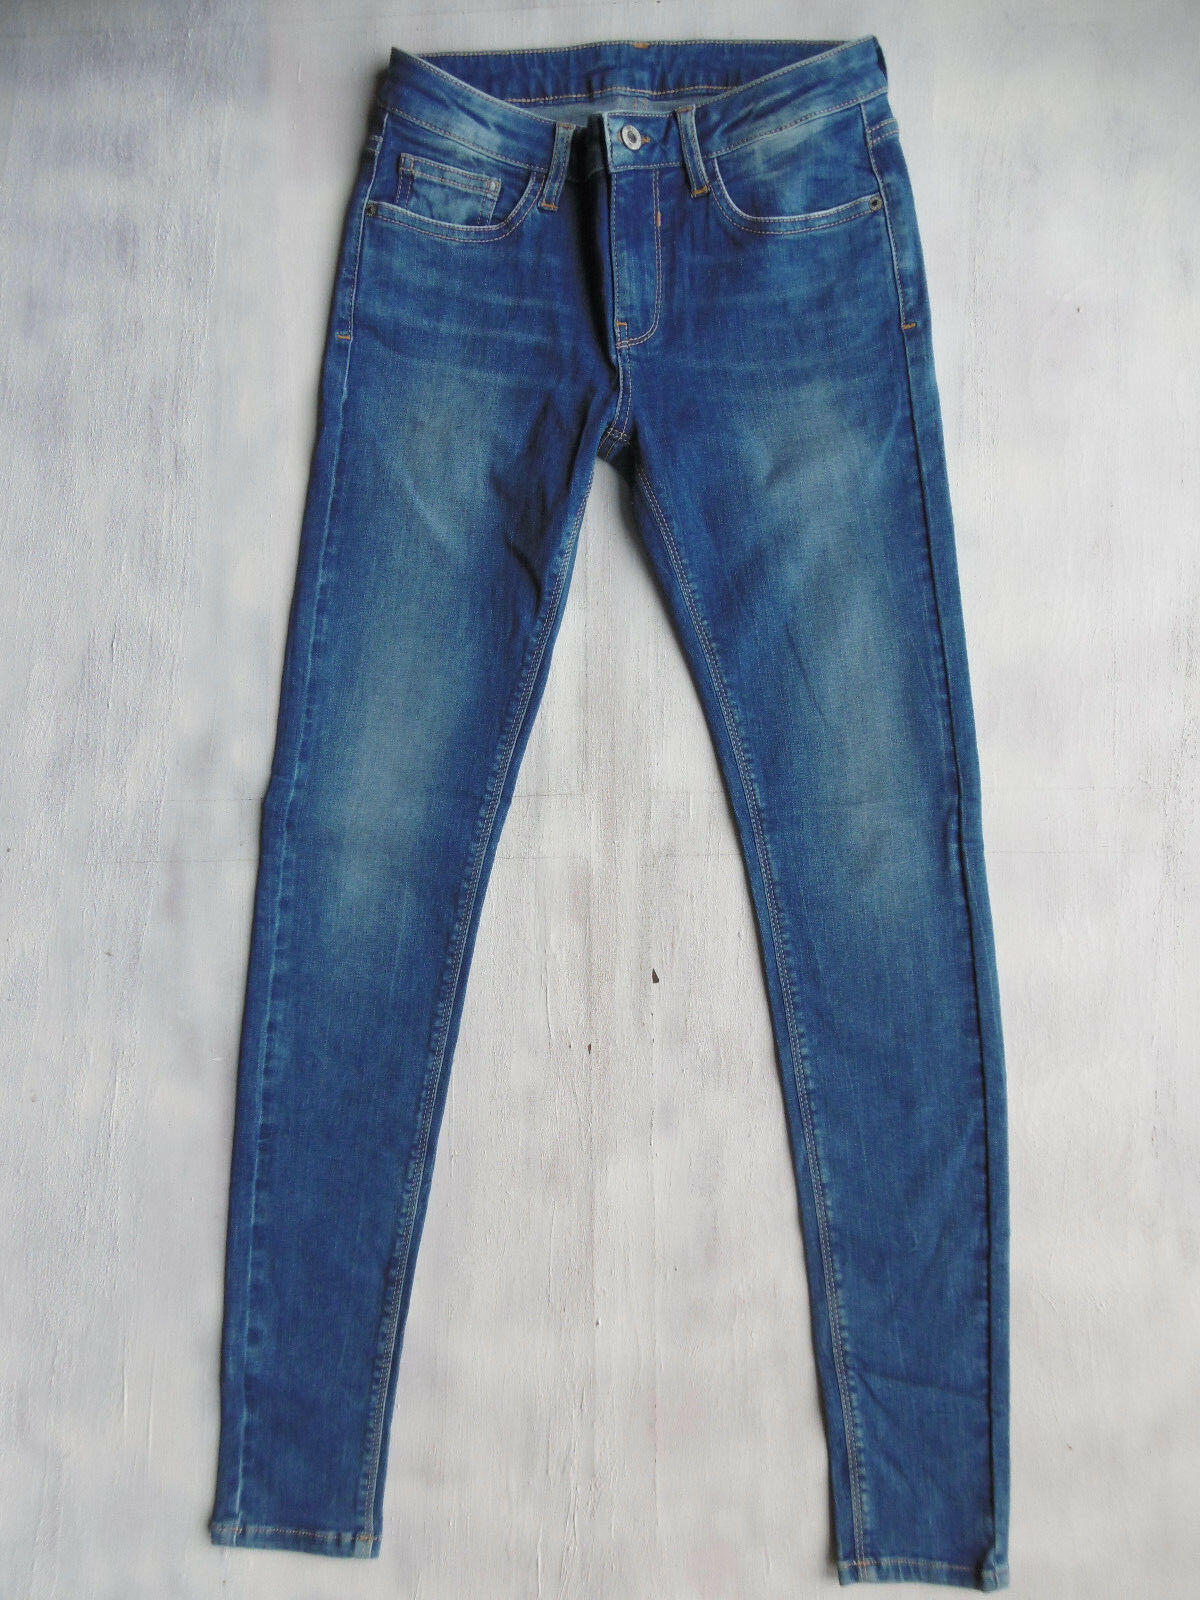 Pepe London Woman Super-SKINNY mid-high Jeans Hose blau Gr 34 36 W27 L32 Neu 56